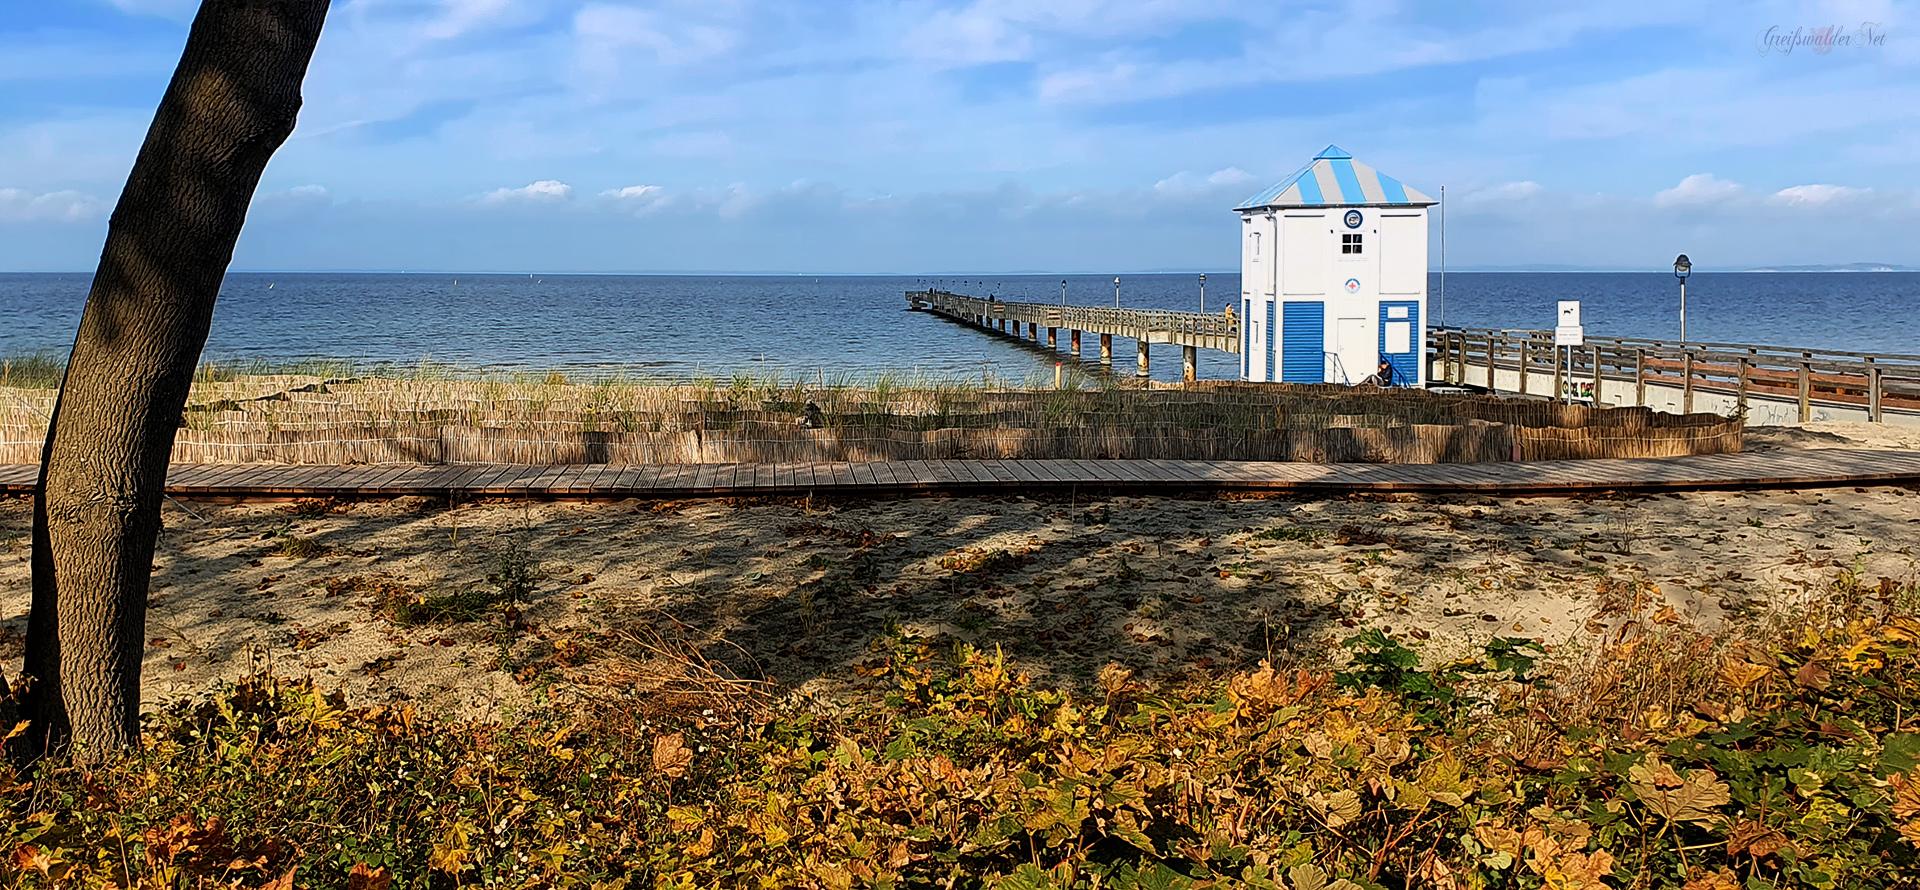 Seebrücke Lubmin, Herrliches Herbstwetter im Seebad Lubmin